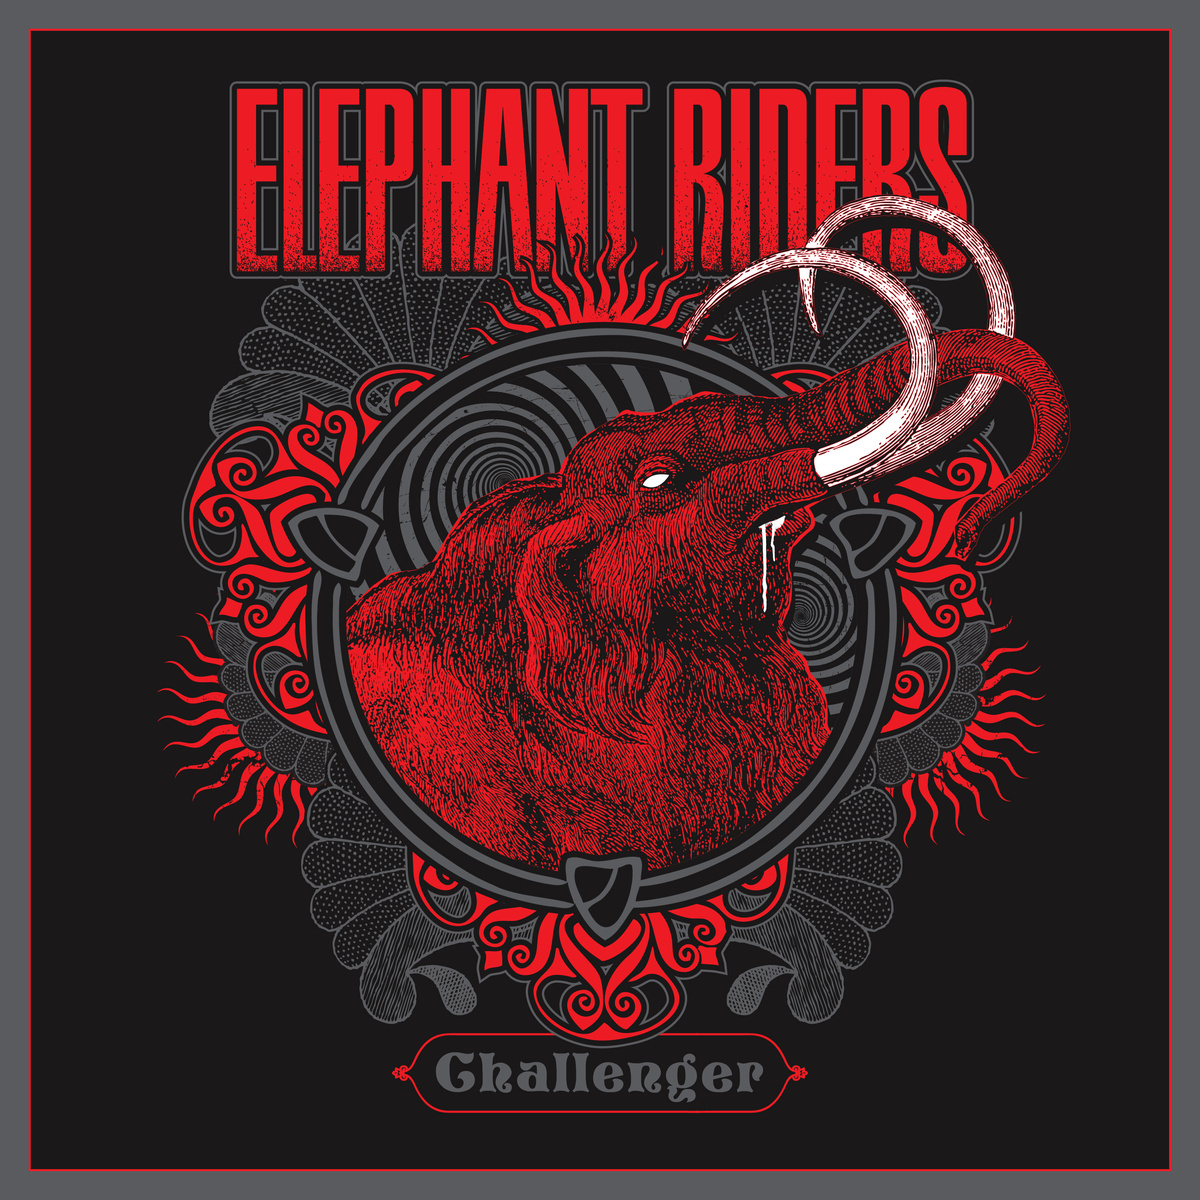 elephant riders challenger